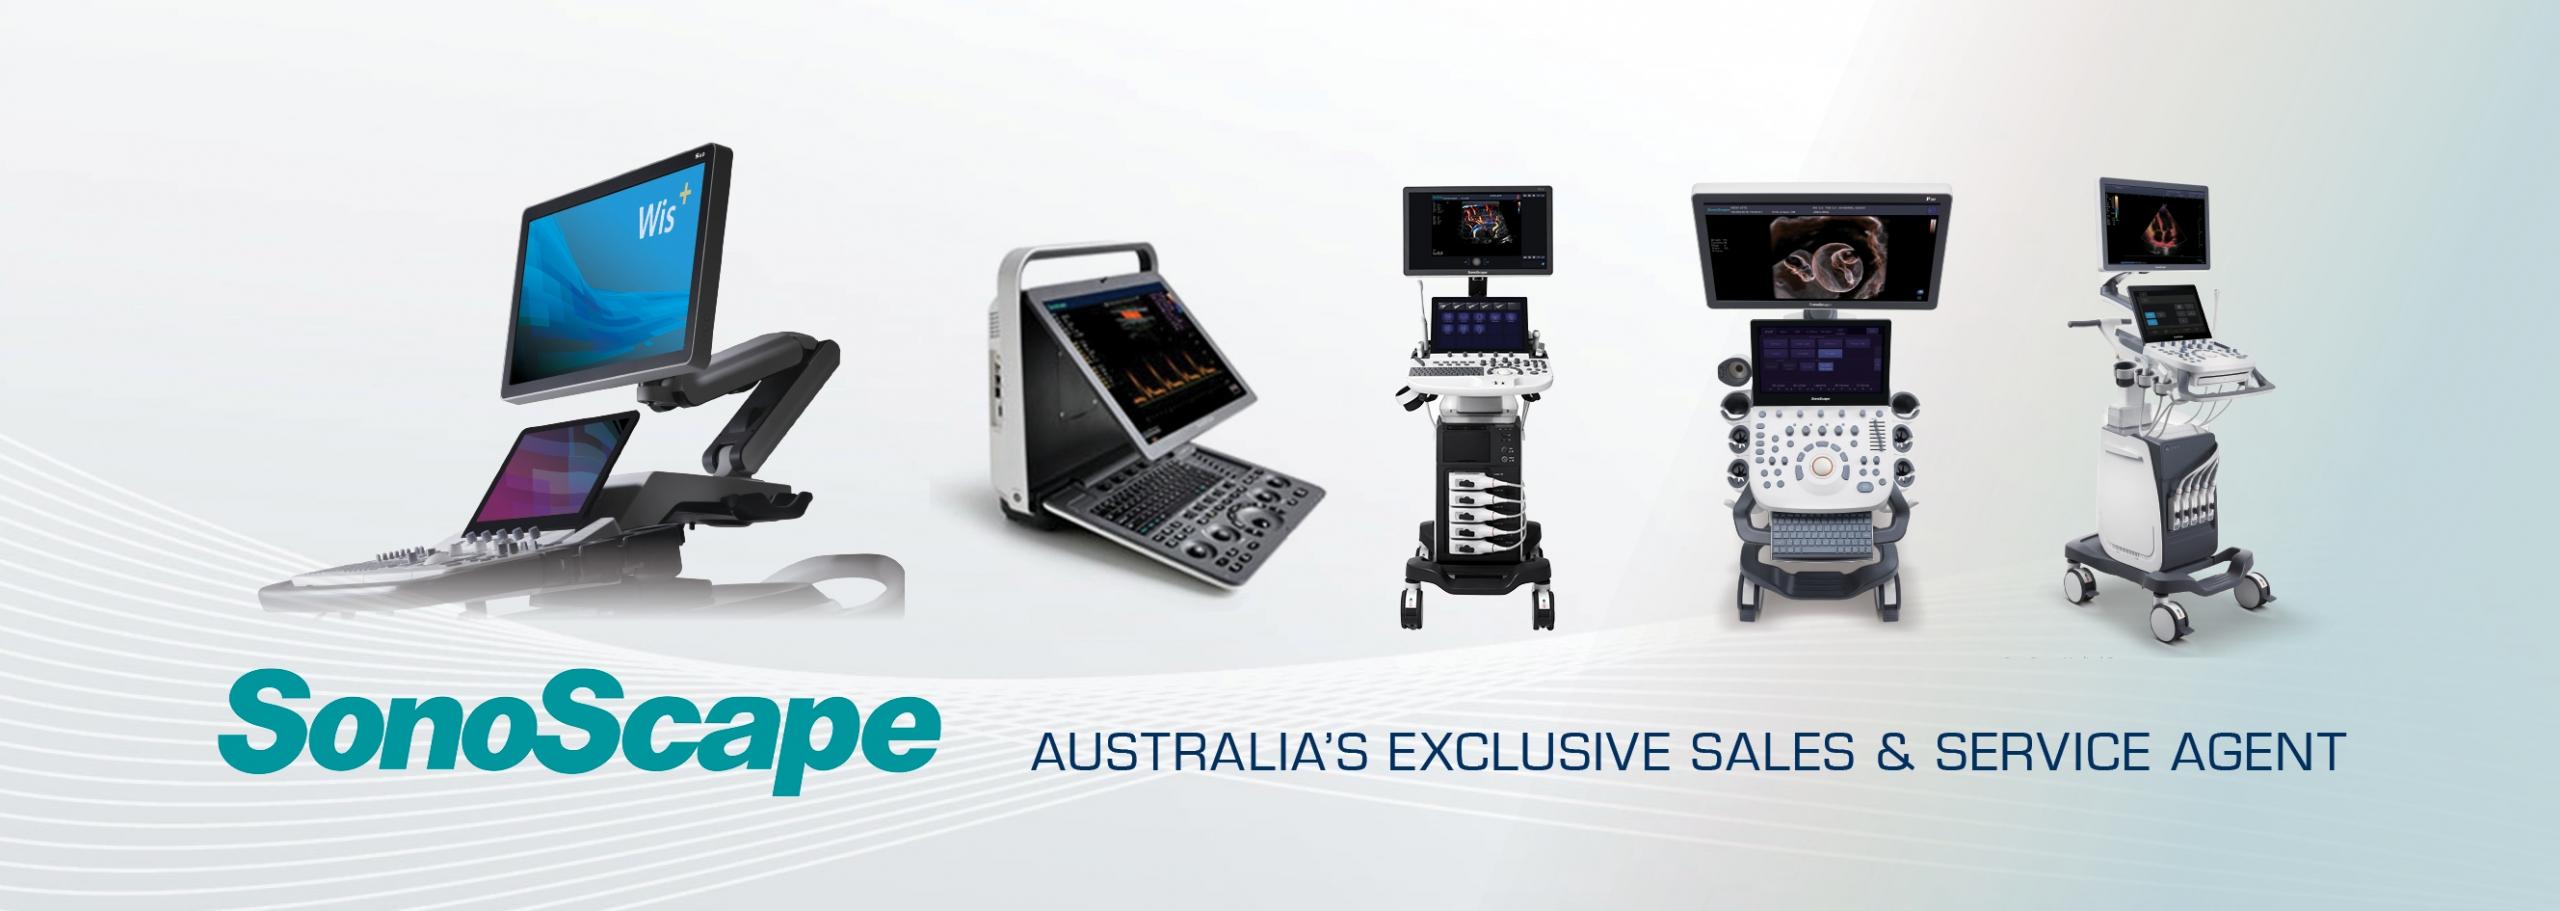 Sonoscape - Exclusive to Sonologic Australia